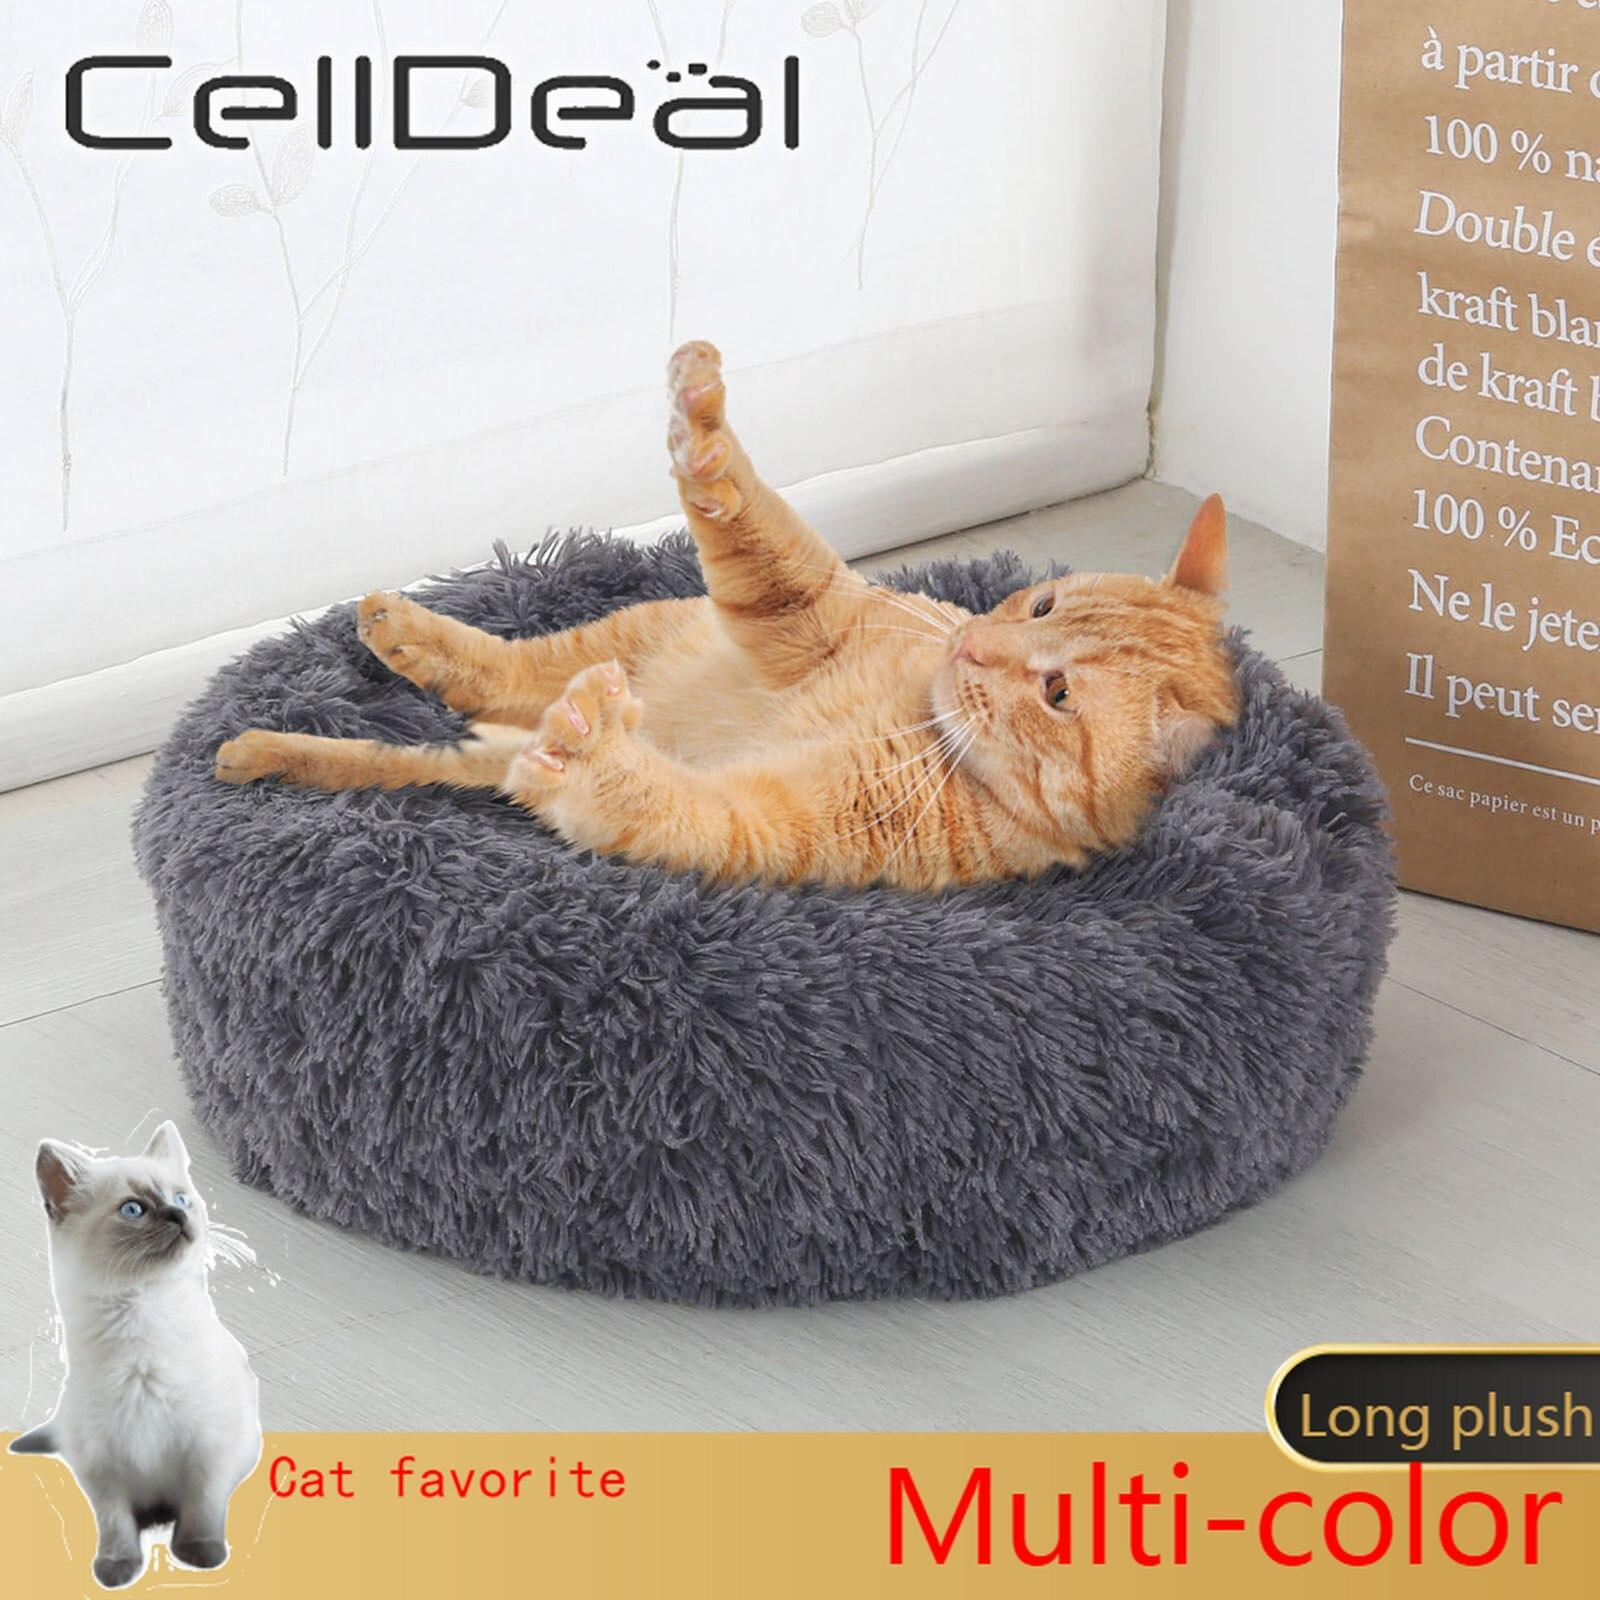 14 Colors Super Soft Cat Bed Round Fluffy Cat Sleeping Basket Long Plush Warm Pet Mat Cute Lightweight Comfortable Touch Kennel